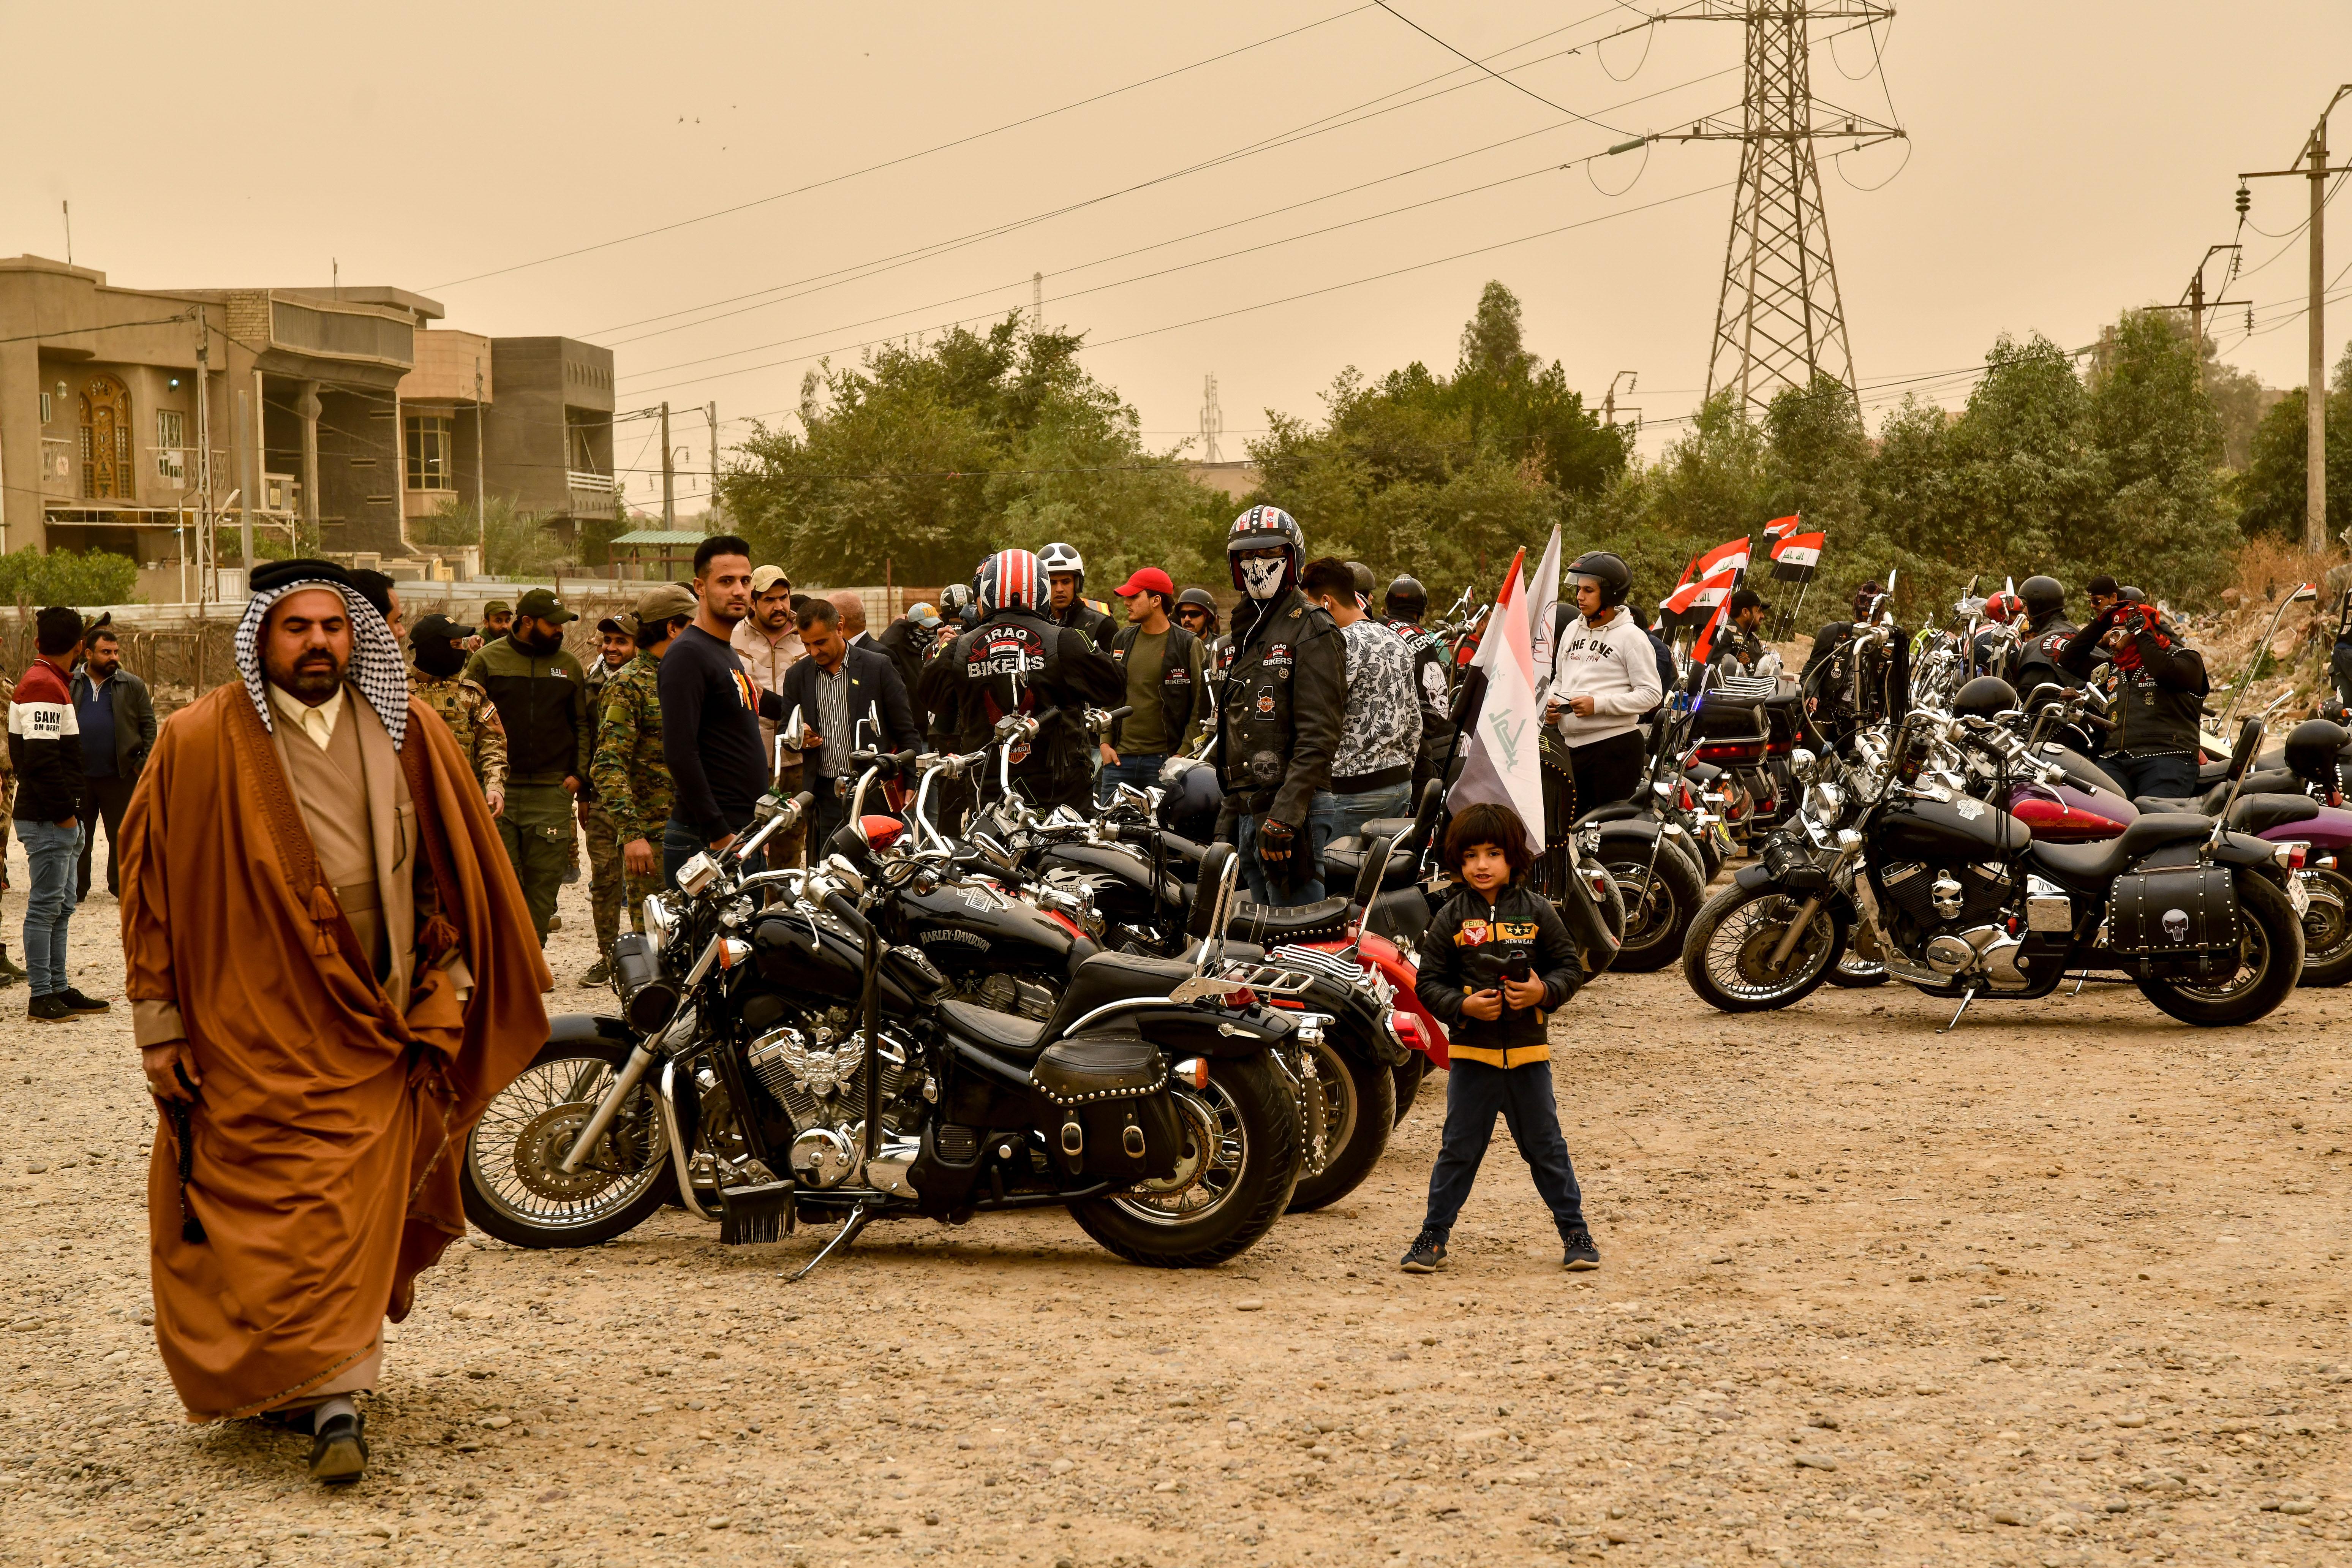 Irak Bikers